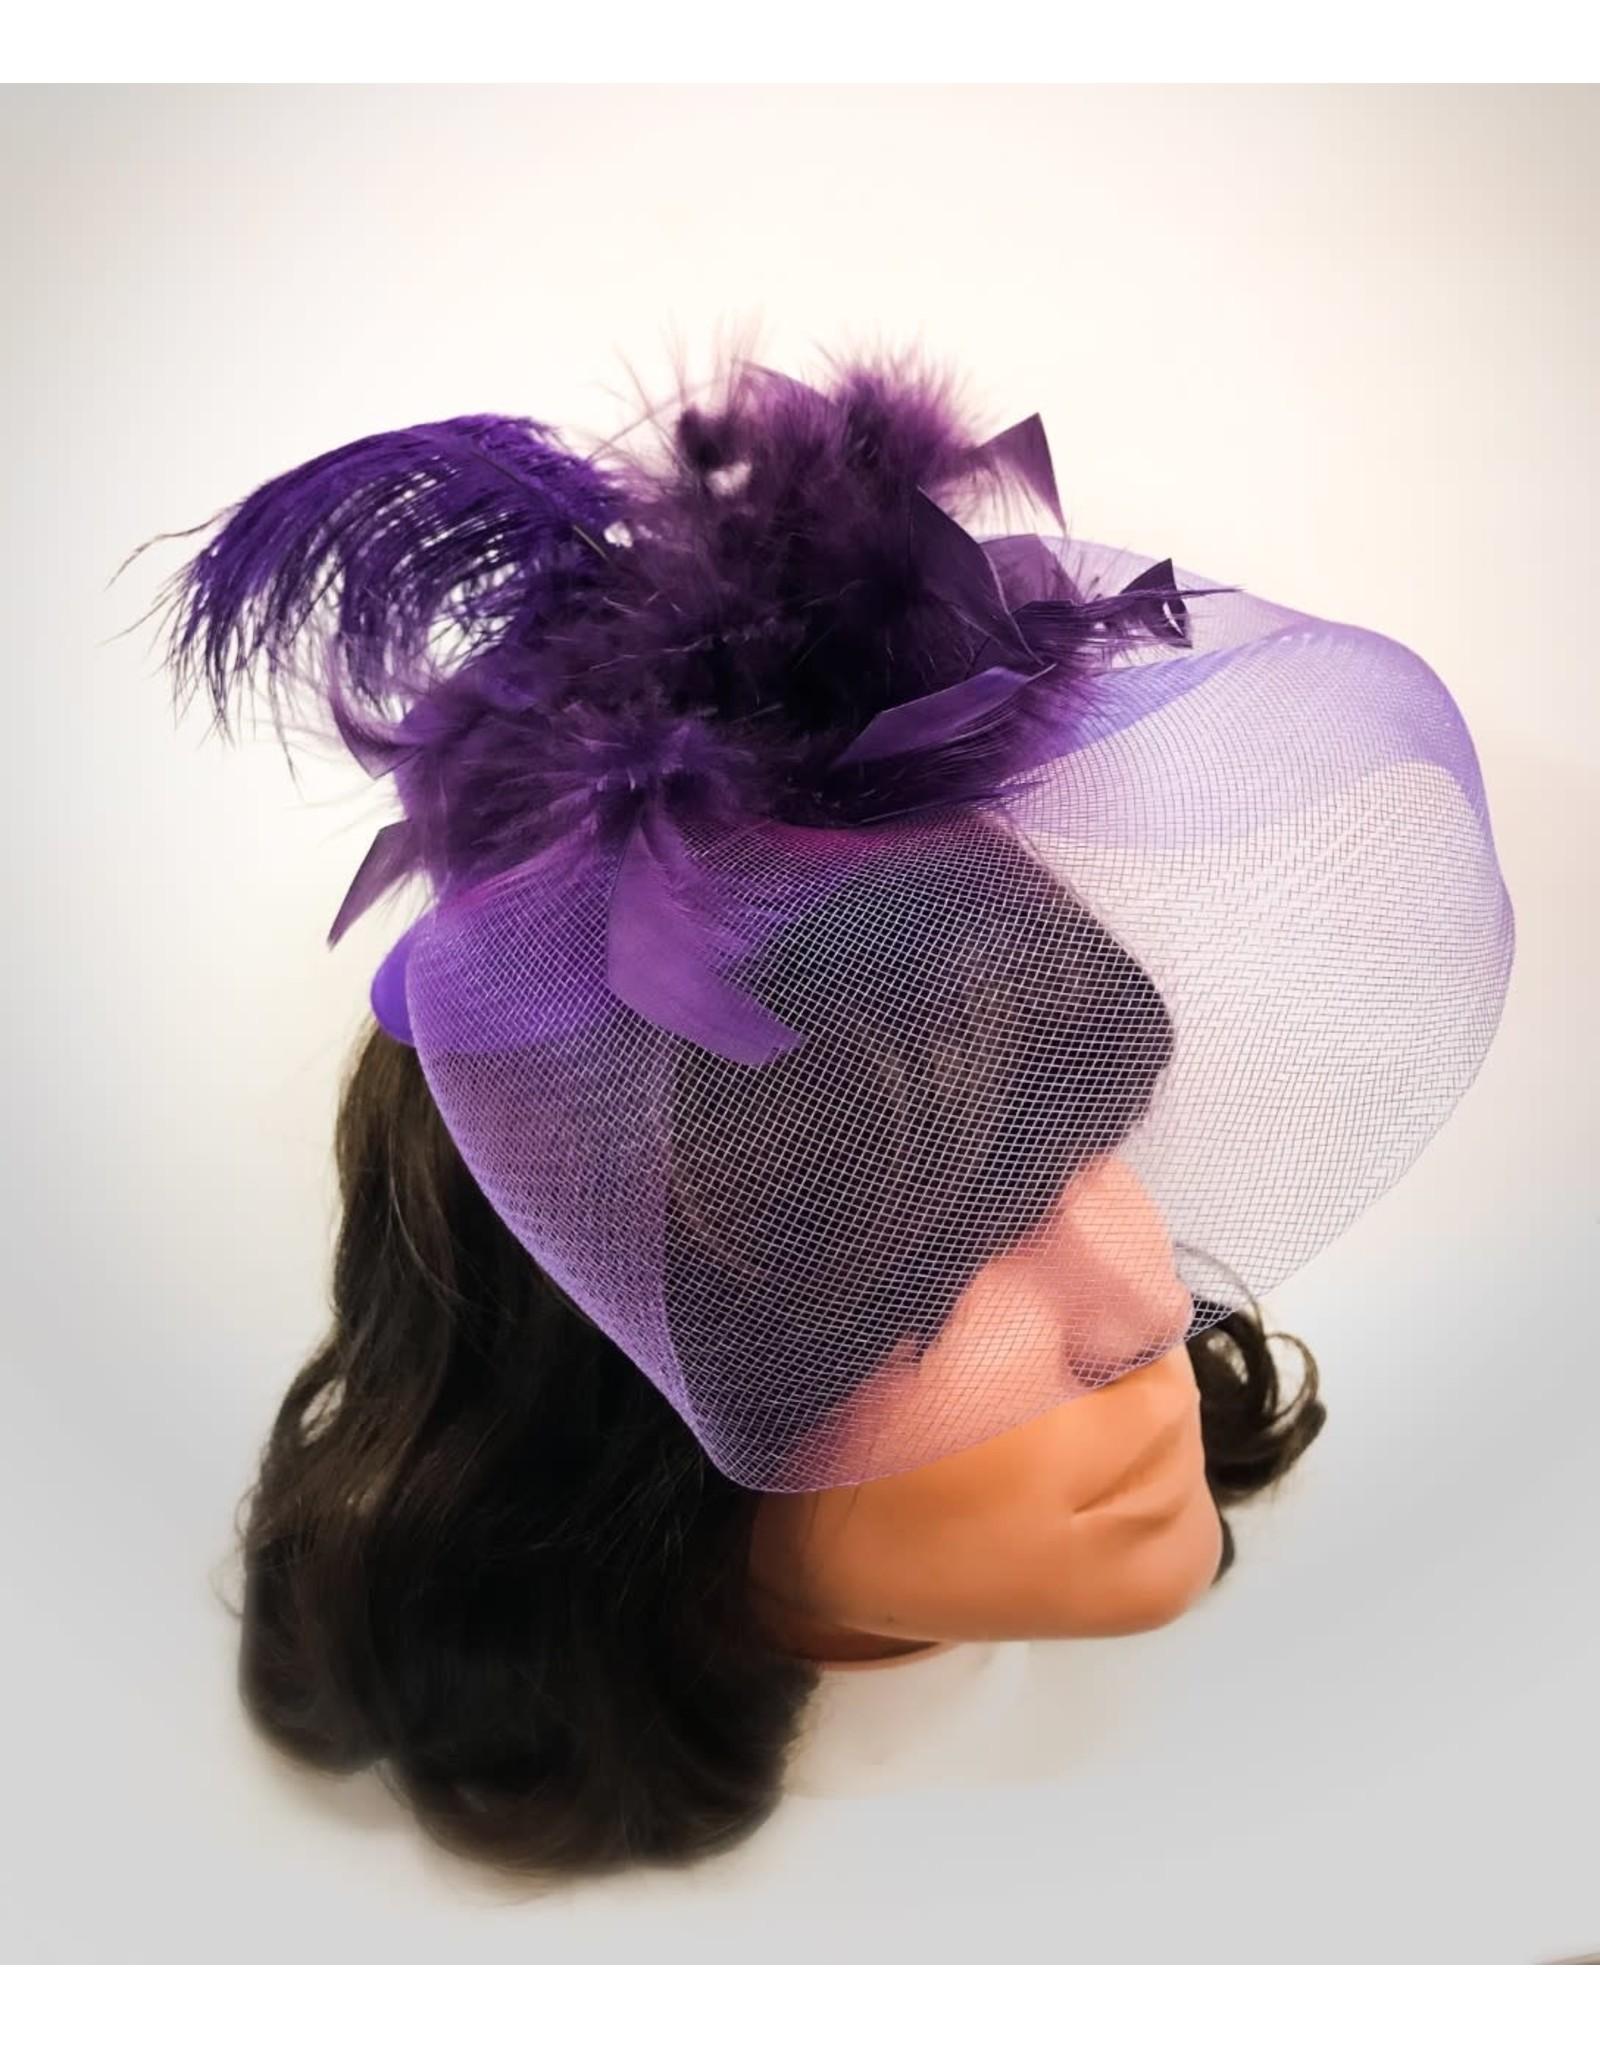 Karries Kostumes Purple Fascinator Mini Top Hat